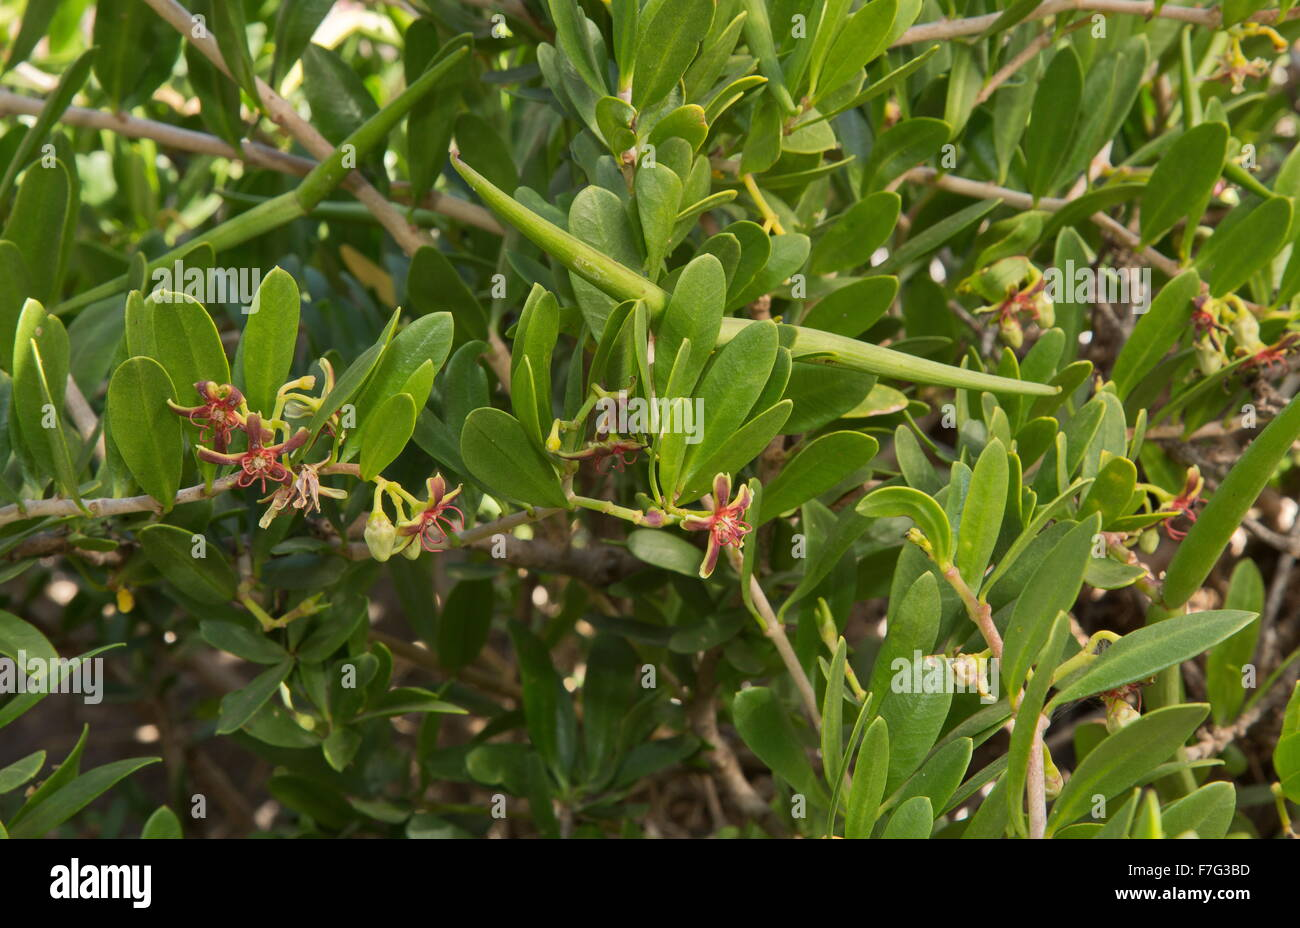 A shrubby milkweed relative, Periploca laevigata, in flower and fruit. Lanzarote. - Stock Image